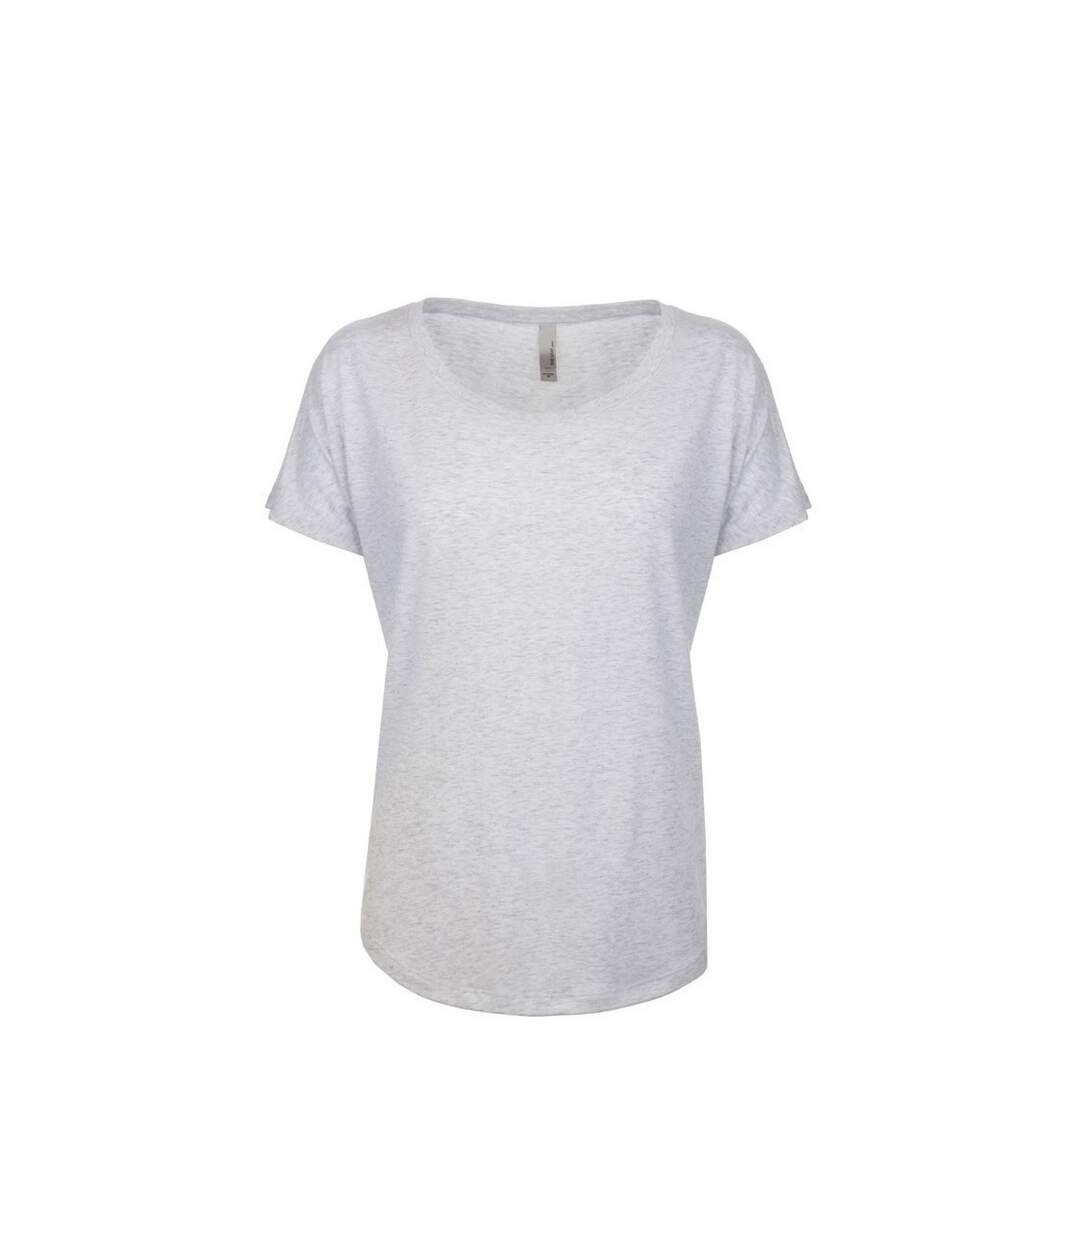 Next Level - Tri-Blend Dolman T-Shirt - Femme (Blanc chiné) - UTPC3494